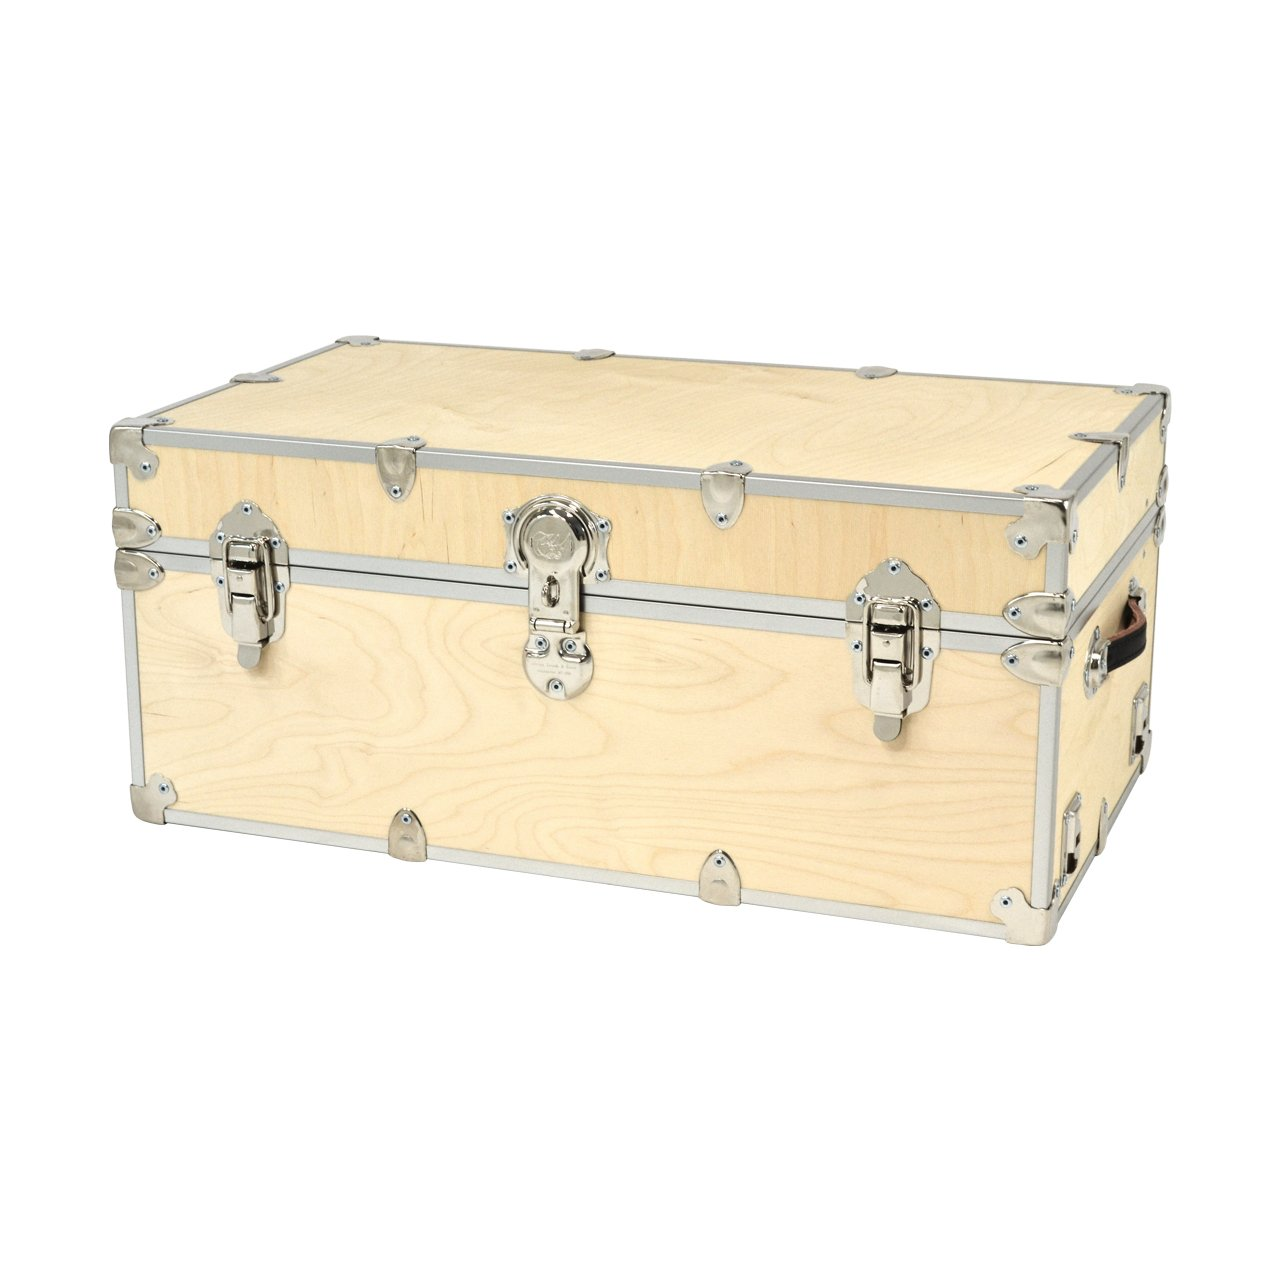 SecureOnCampus College Dorm Storage Trunks / Footlockers Large 32''L x 18''W x 14''H- Birch Wood